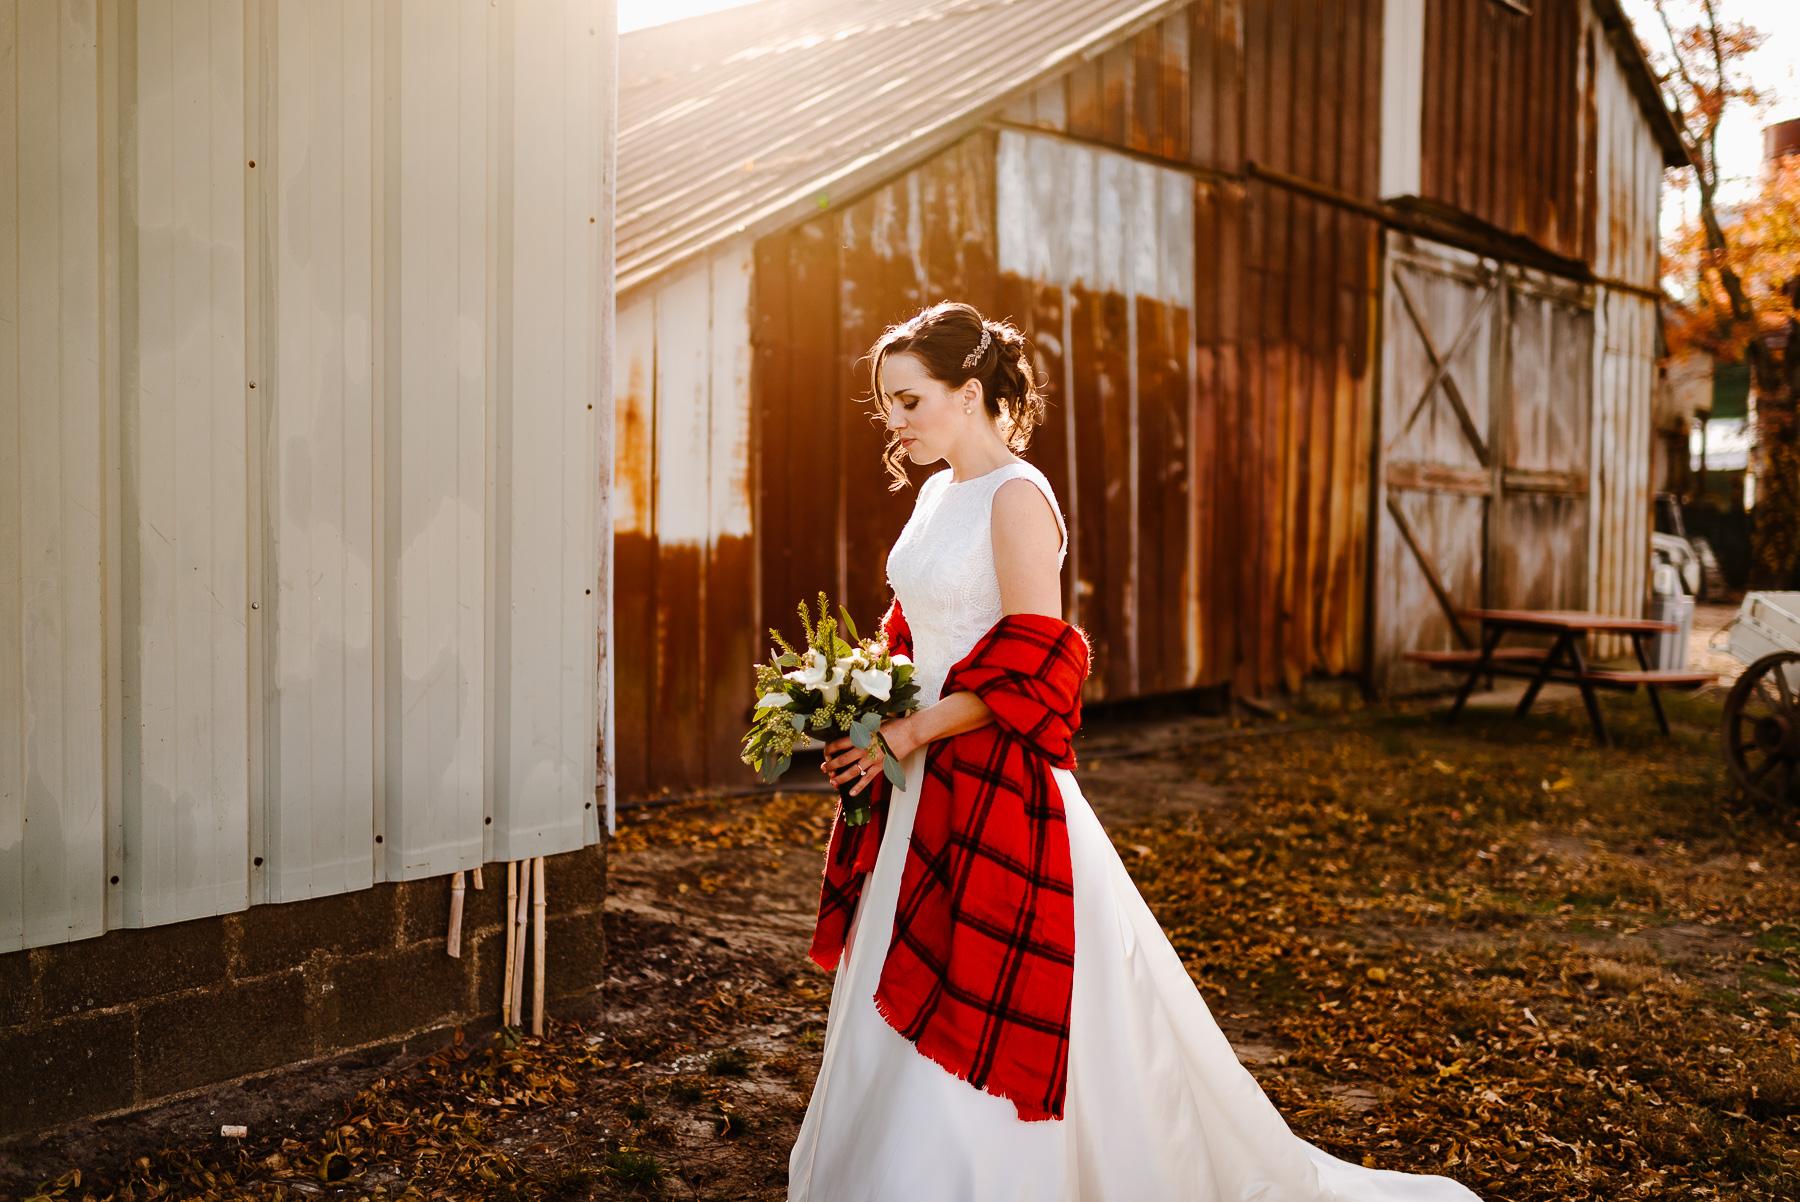 65-Laurita Winery Wedding New Jersey Wedding Photographer Laurita Winery Weddings Longbrook Photography.jpg